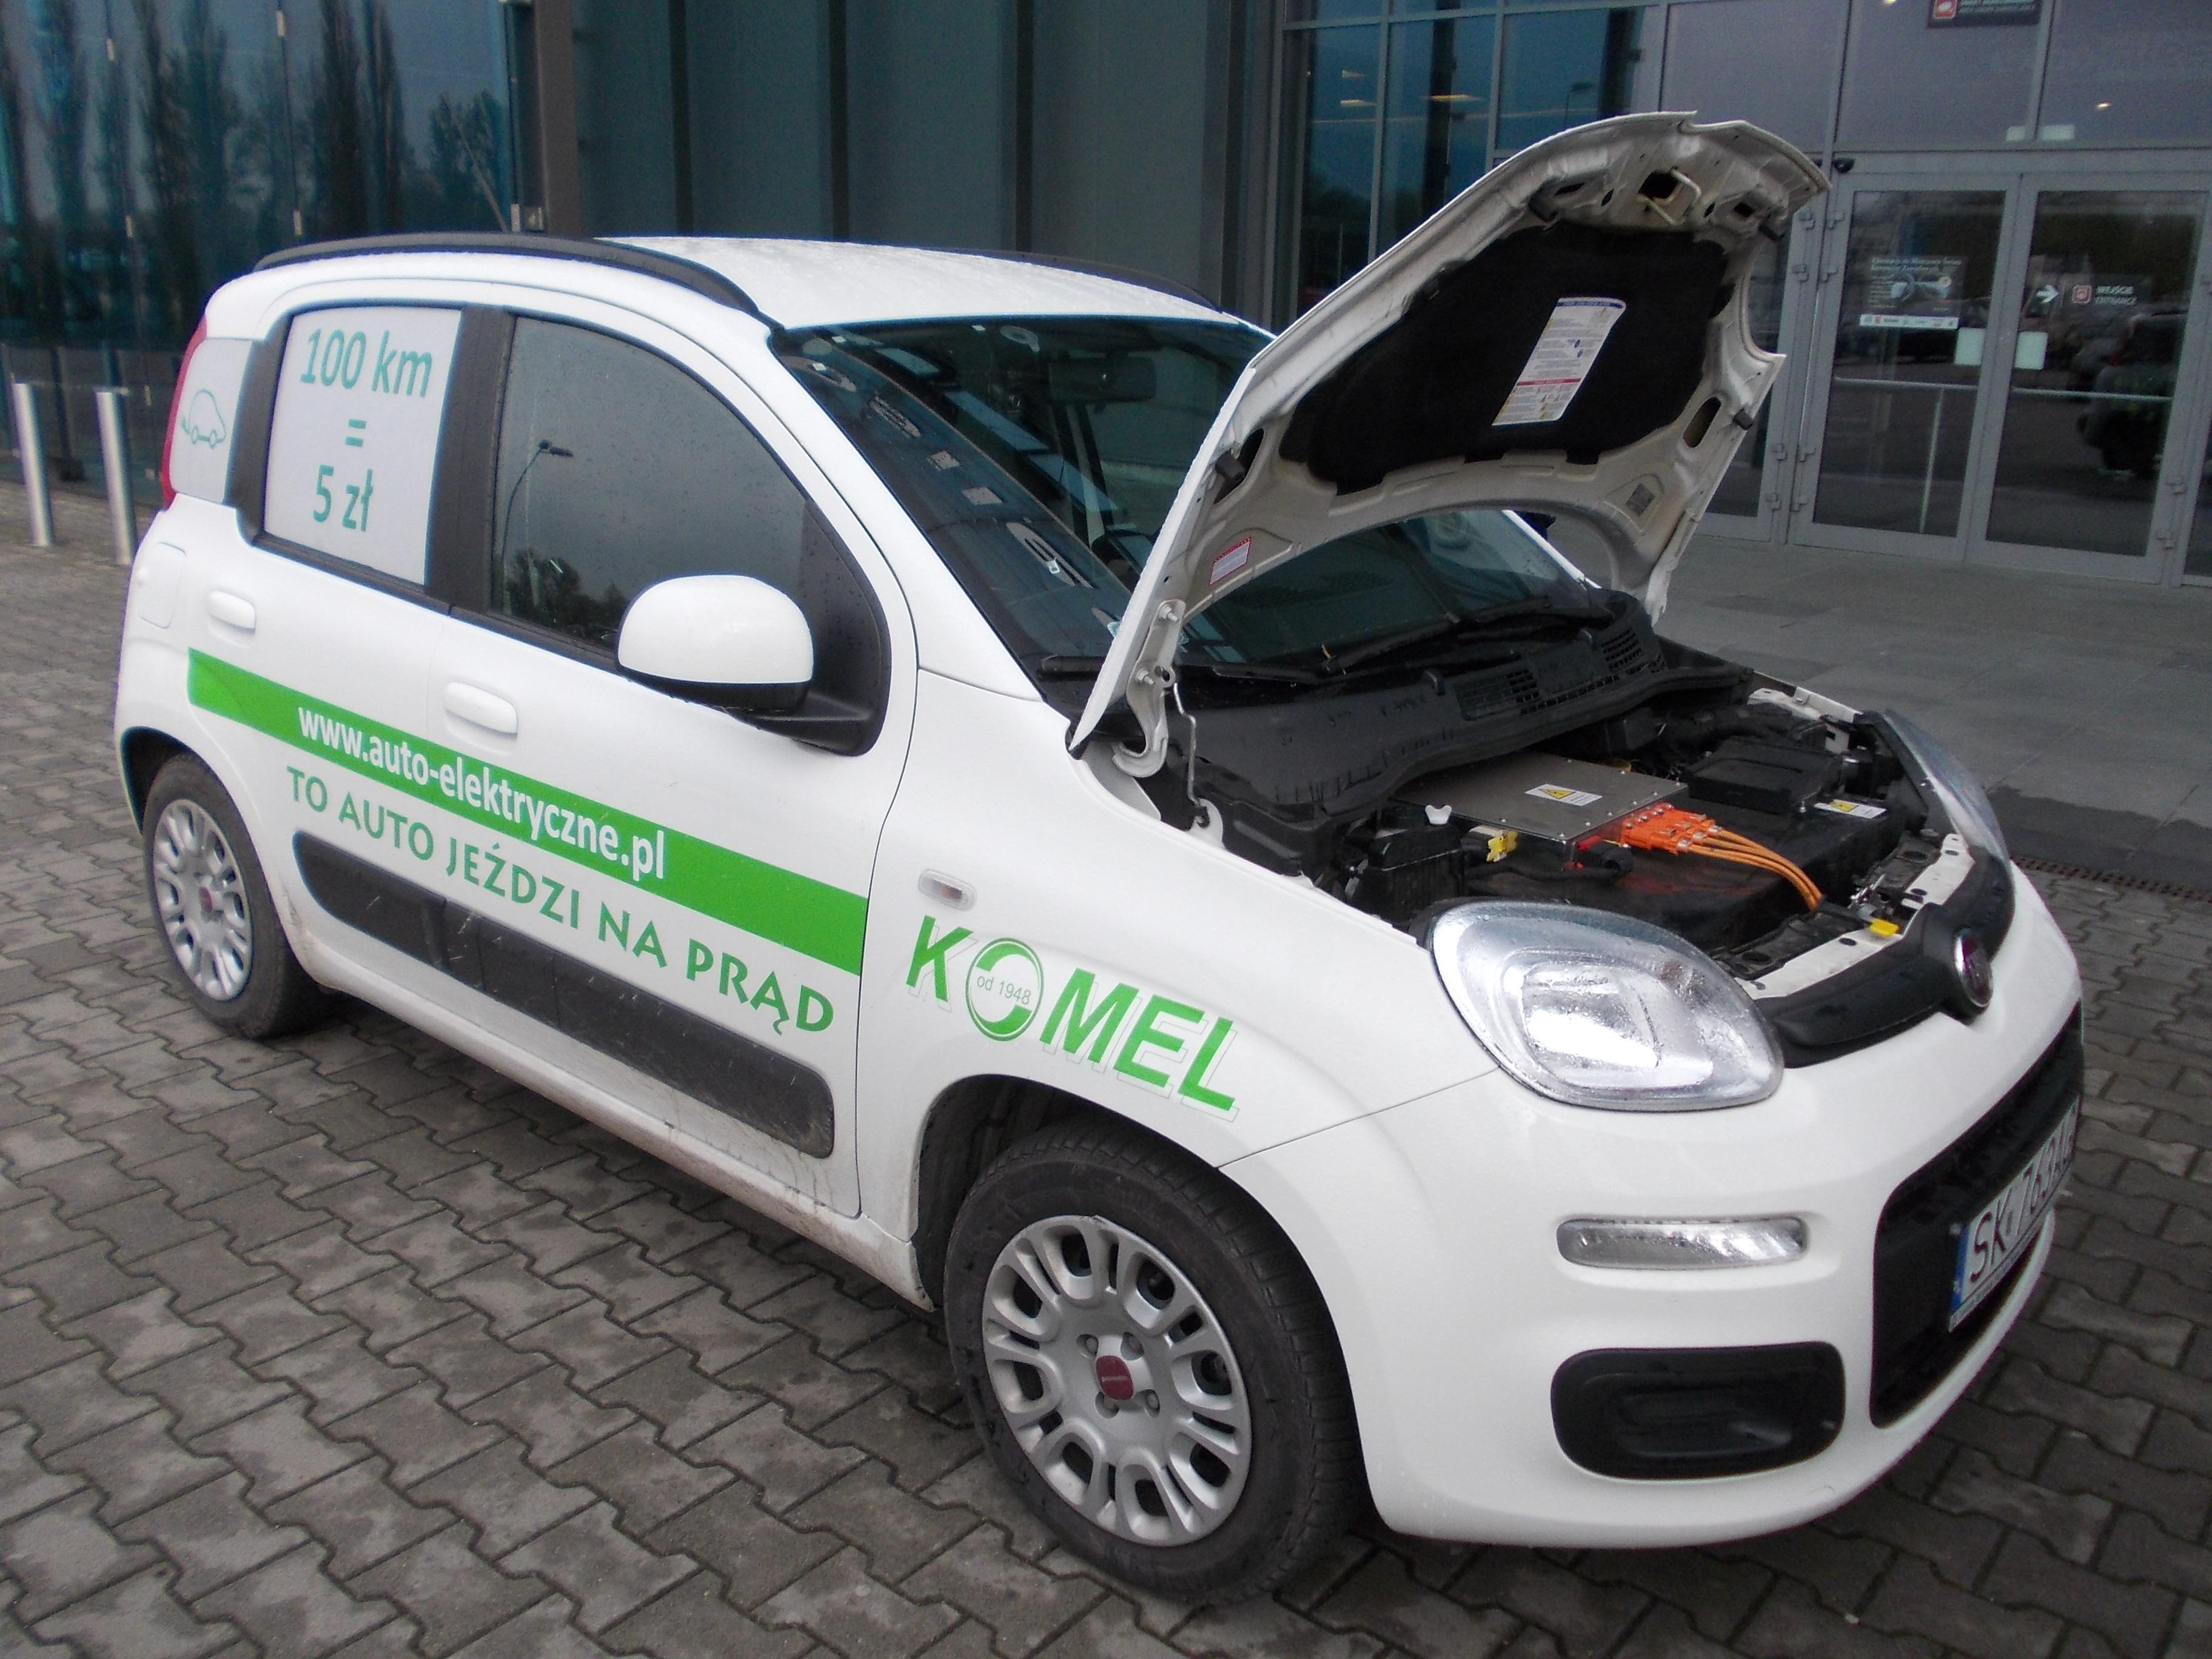 Fantastyczny File:Fiat Panda Komel elektryczny SilesiaKomunikacja14.jpg PP11